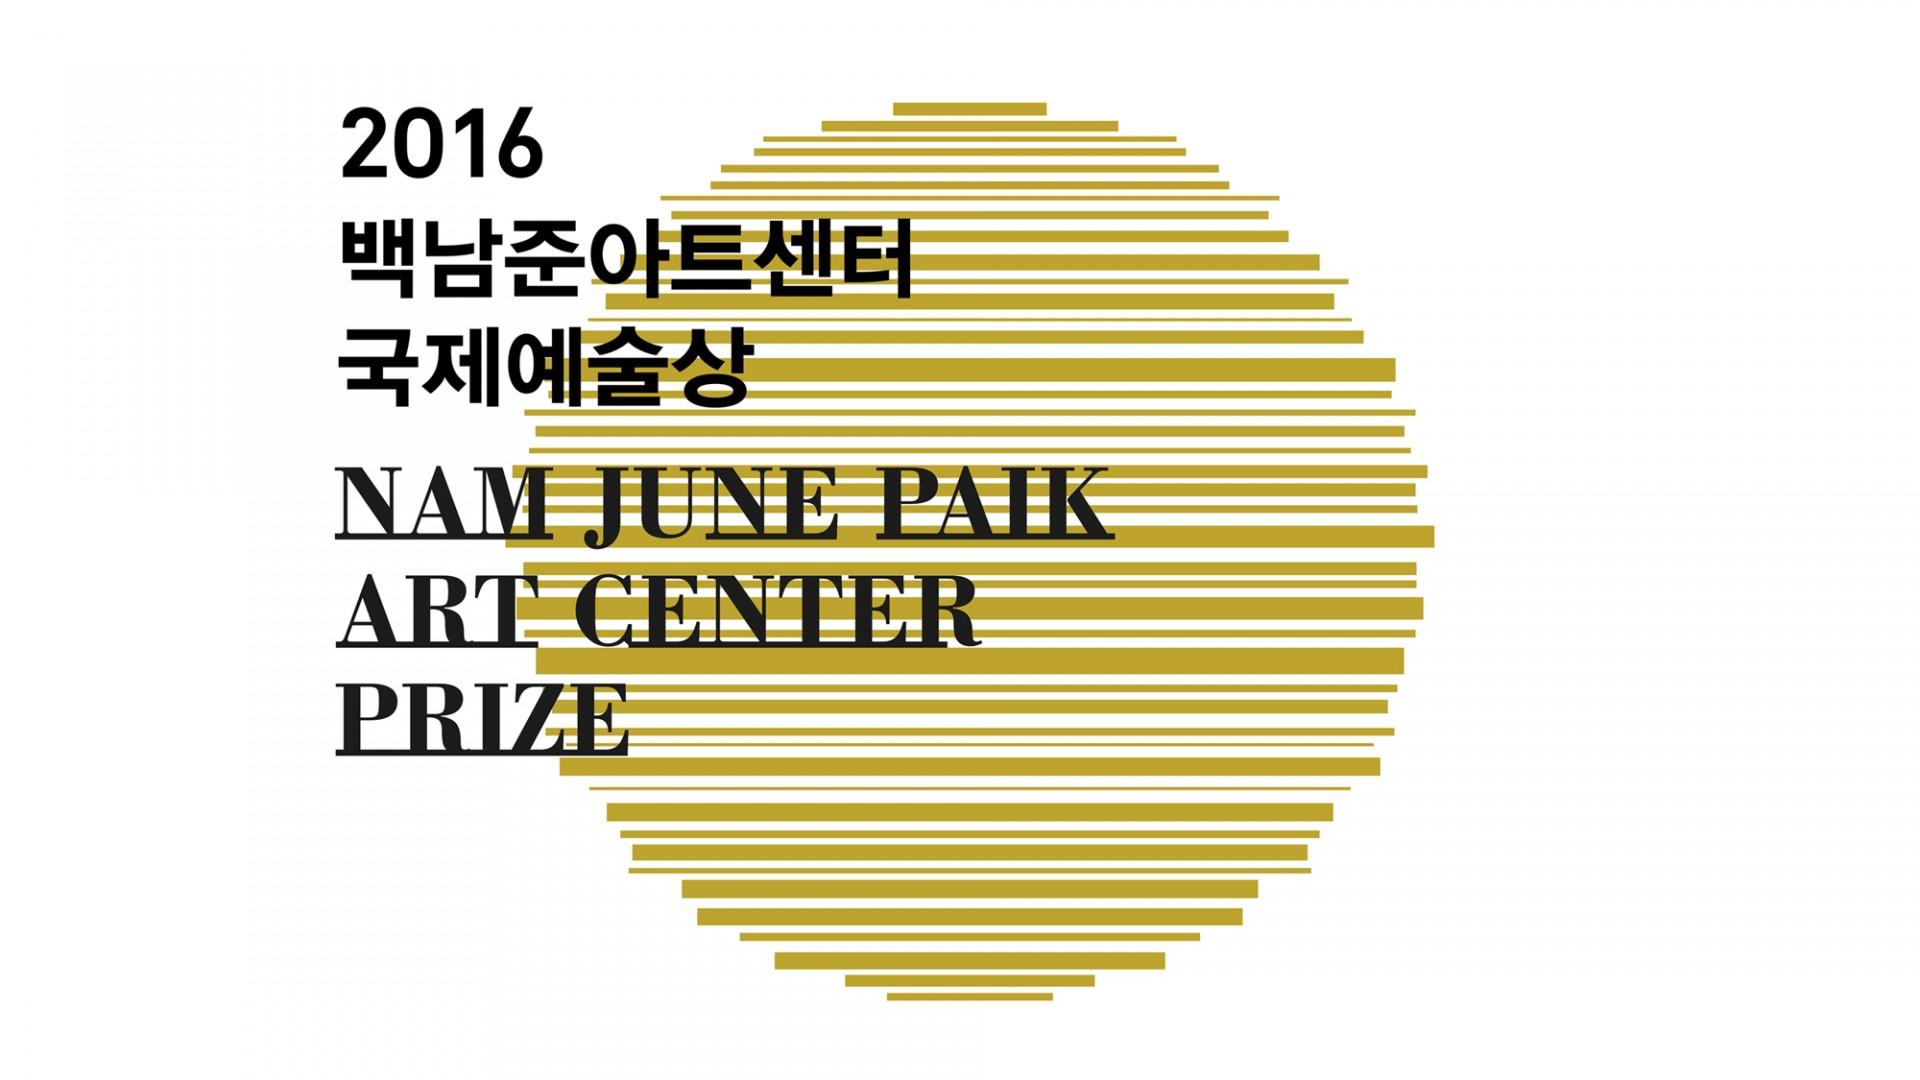 Blast Theory win 2016 Nam June Paik Art Center Prize